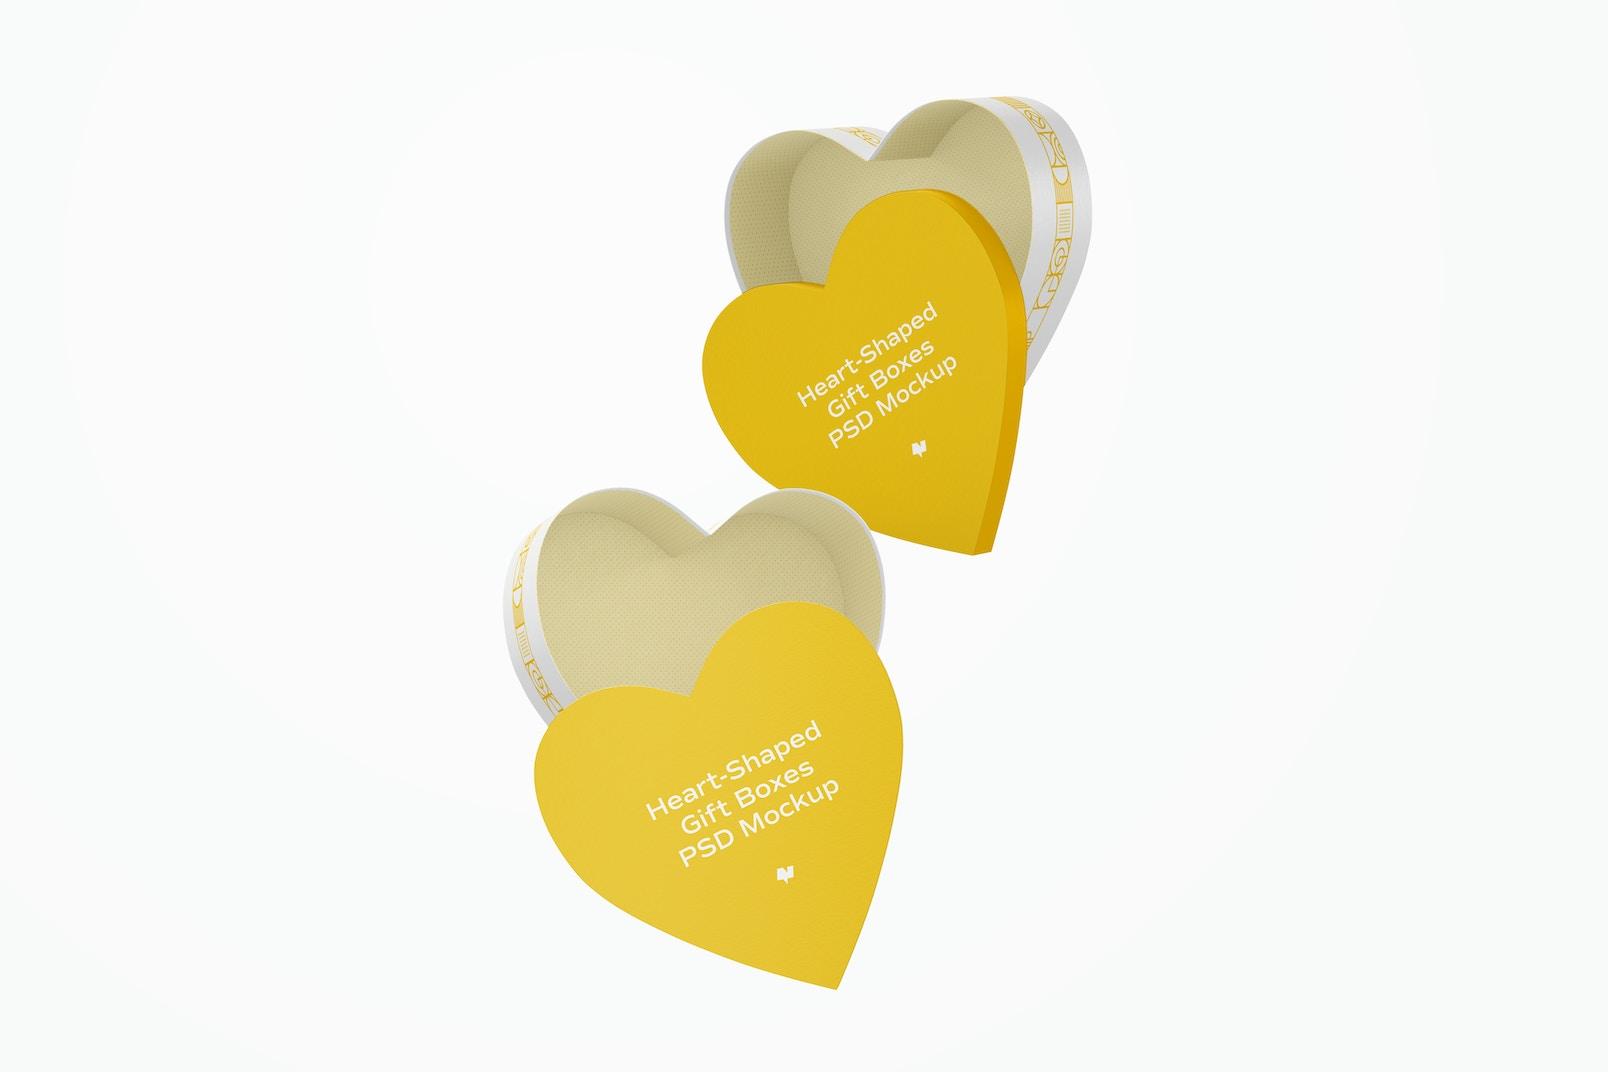 Heart-Shaped Gift Boxes Mockup, Falling